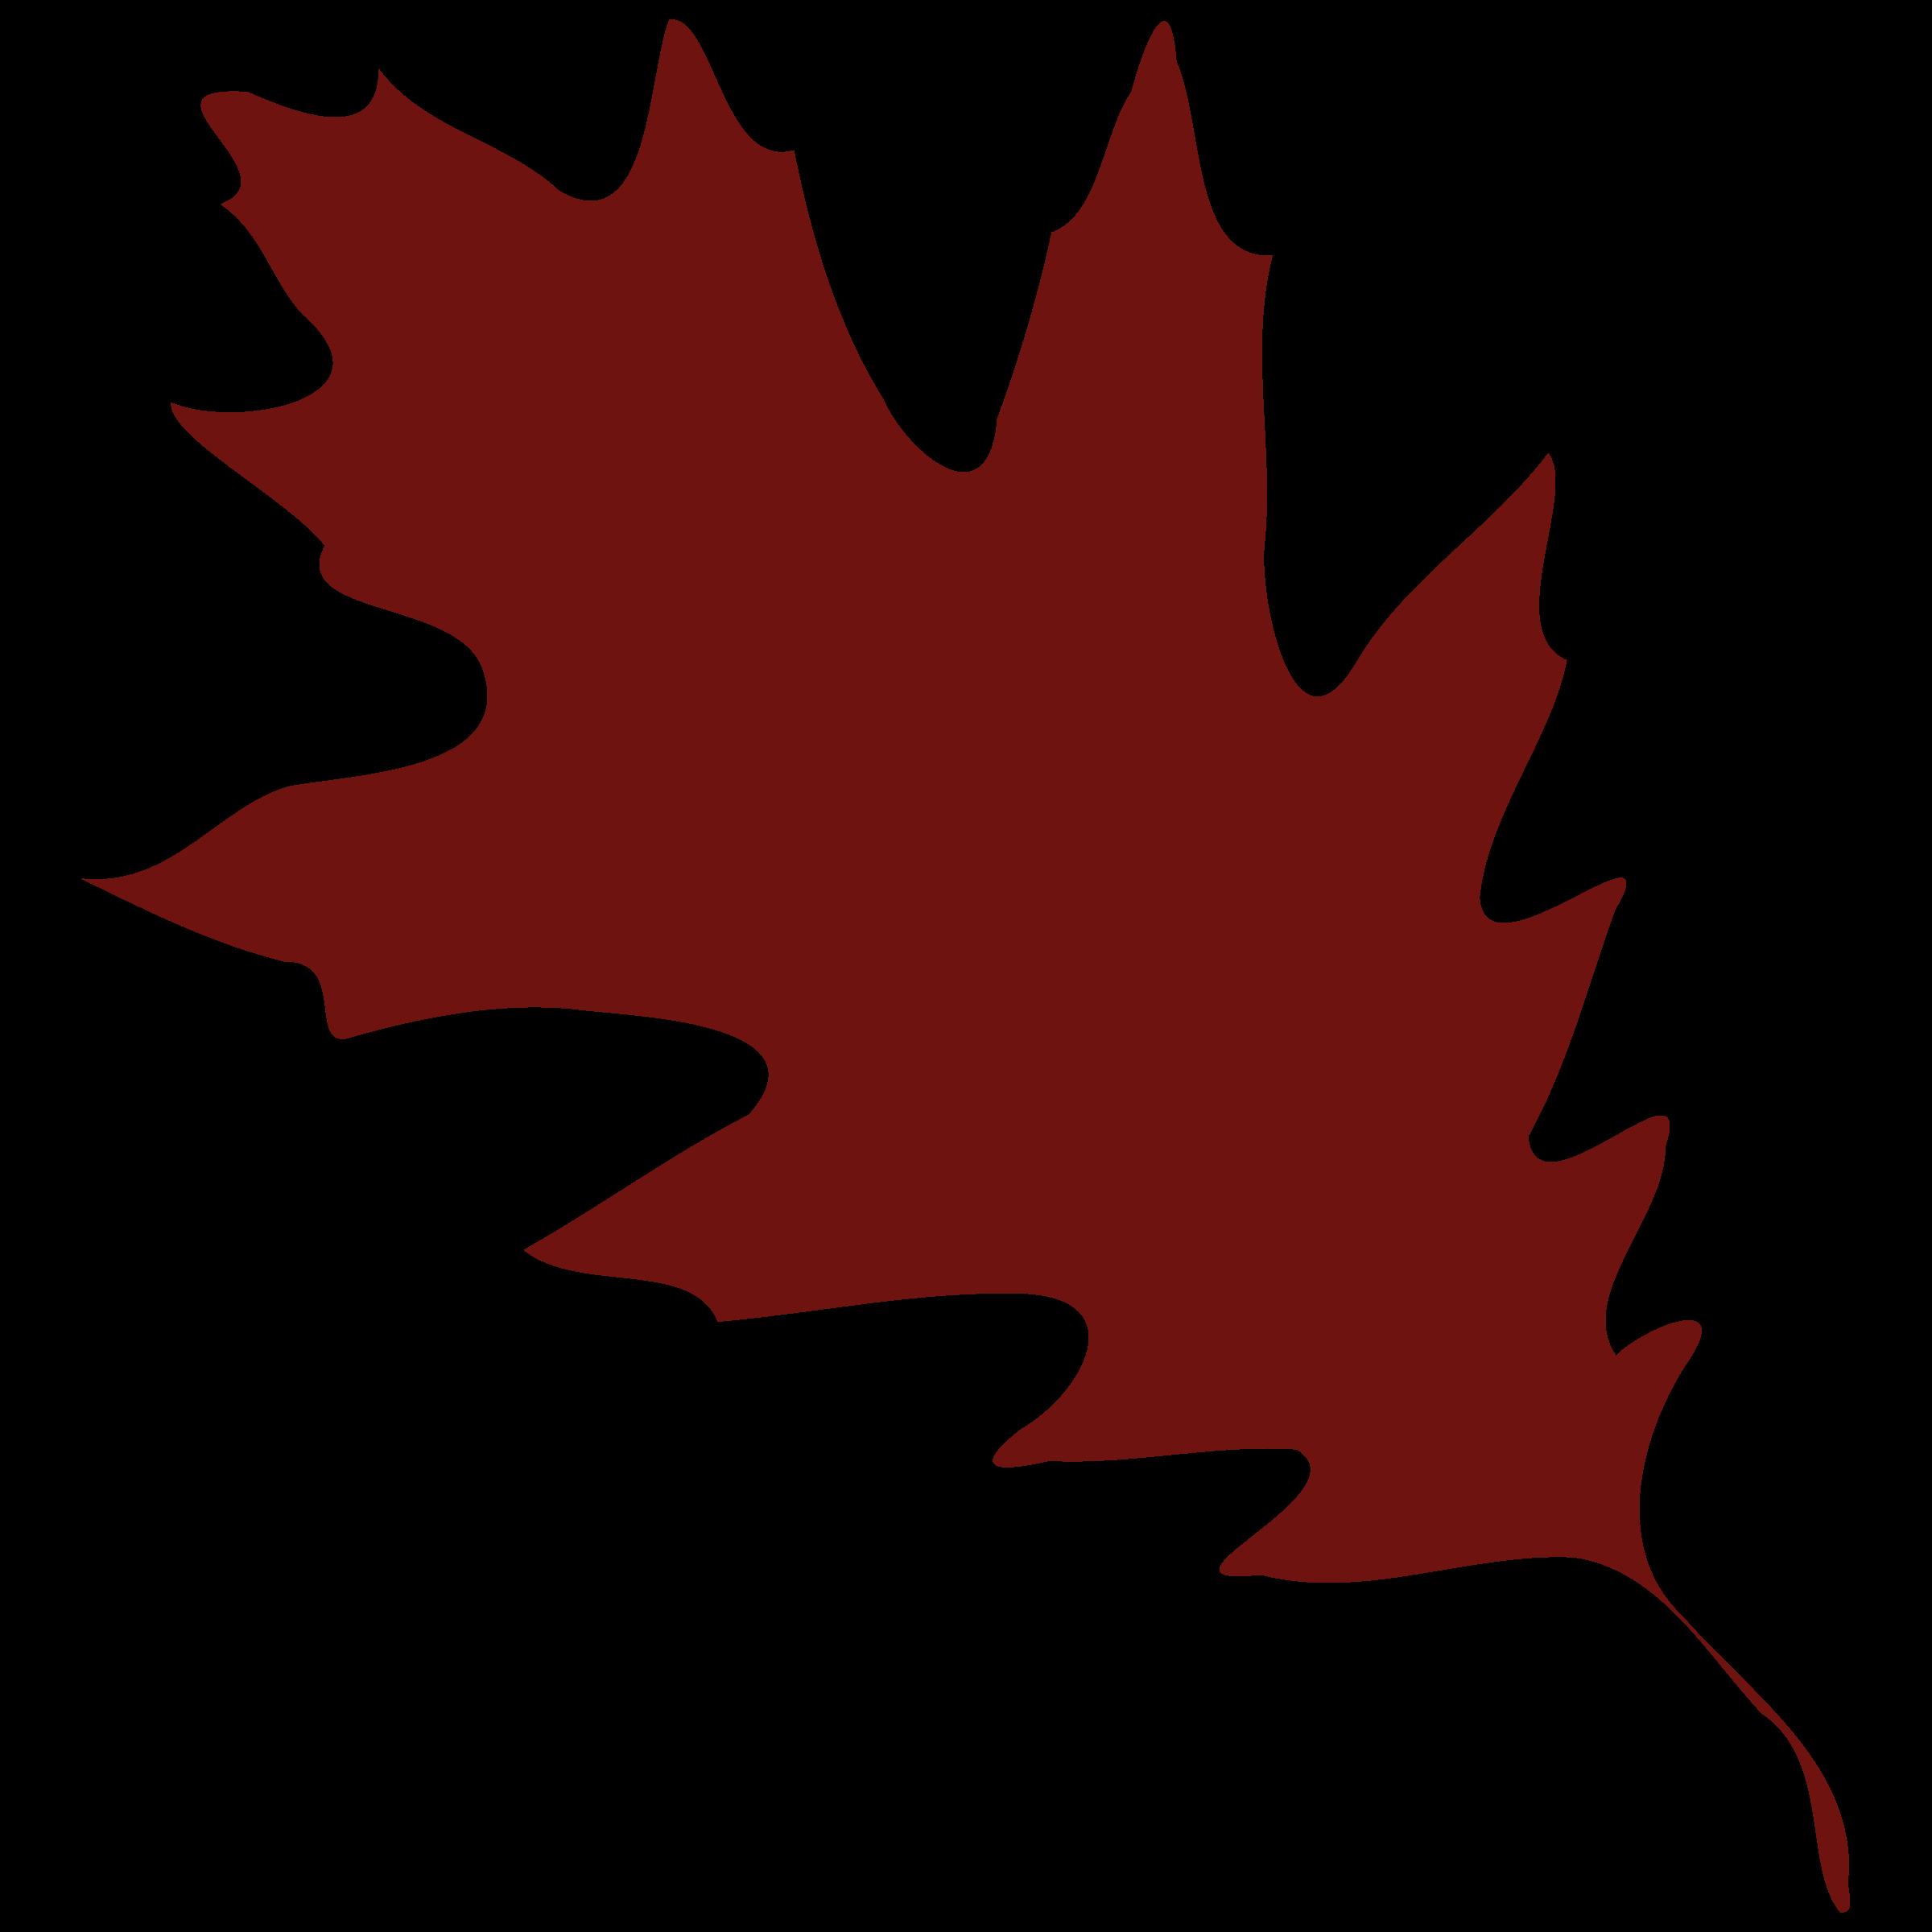 royalty free stock Maple clipart acorn leaf. Oak leaves clip art